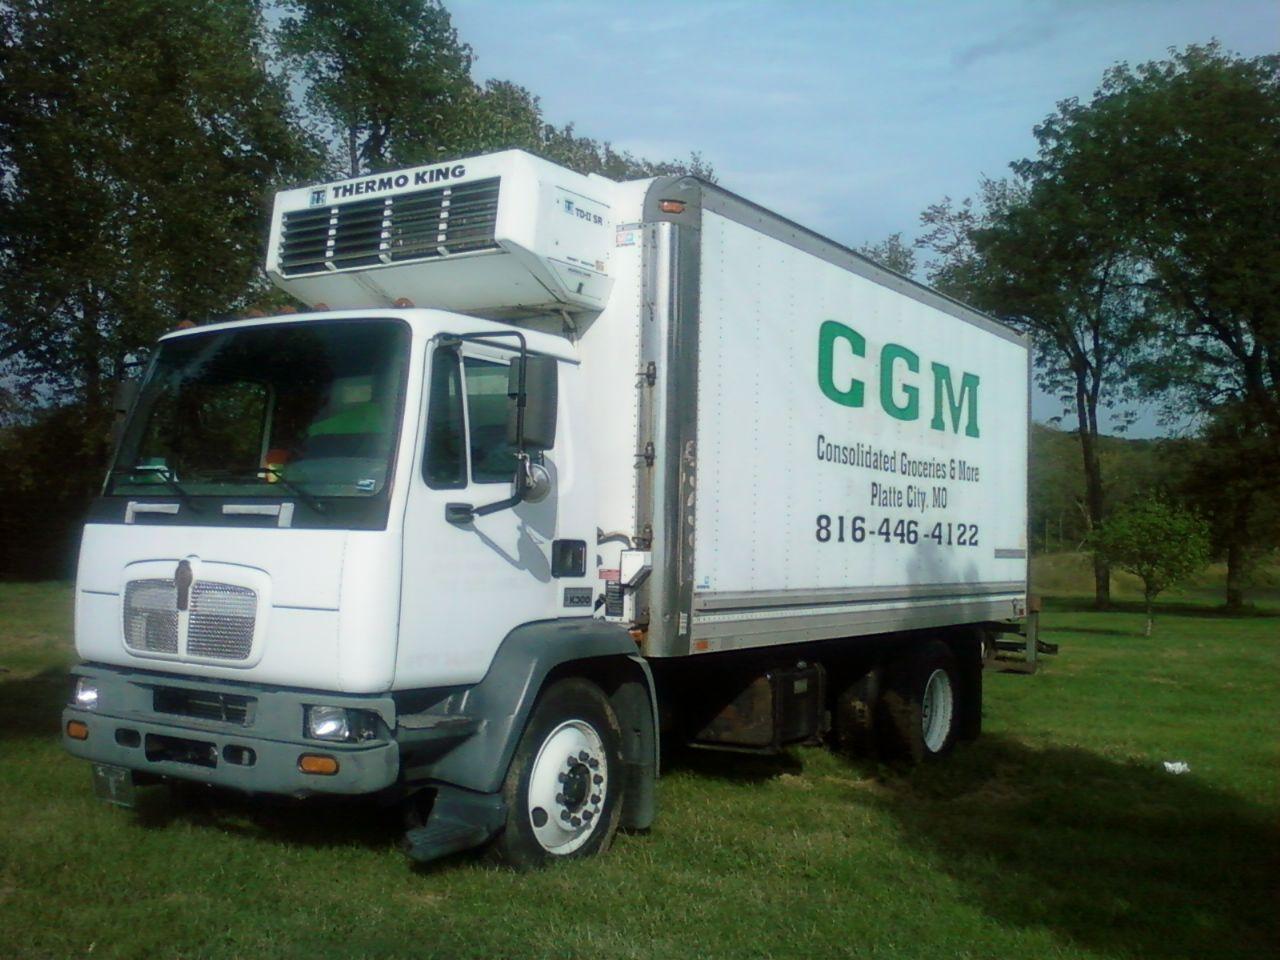 Kenworth K300 Fuse Box Pinterest Trucks And Cars 1280x960